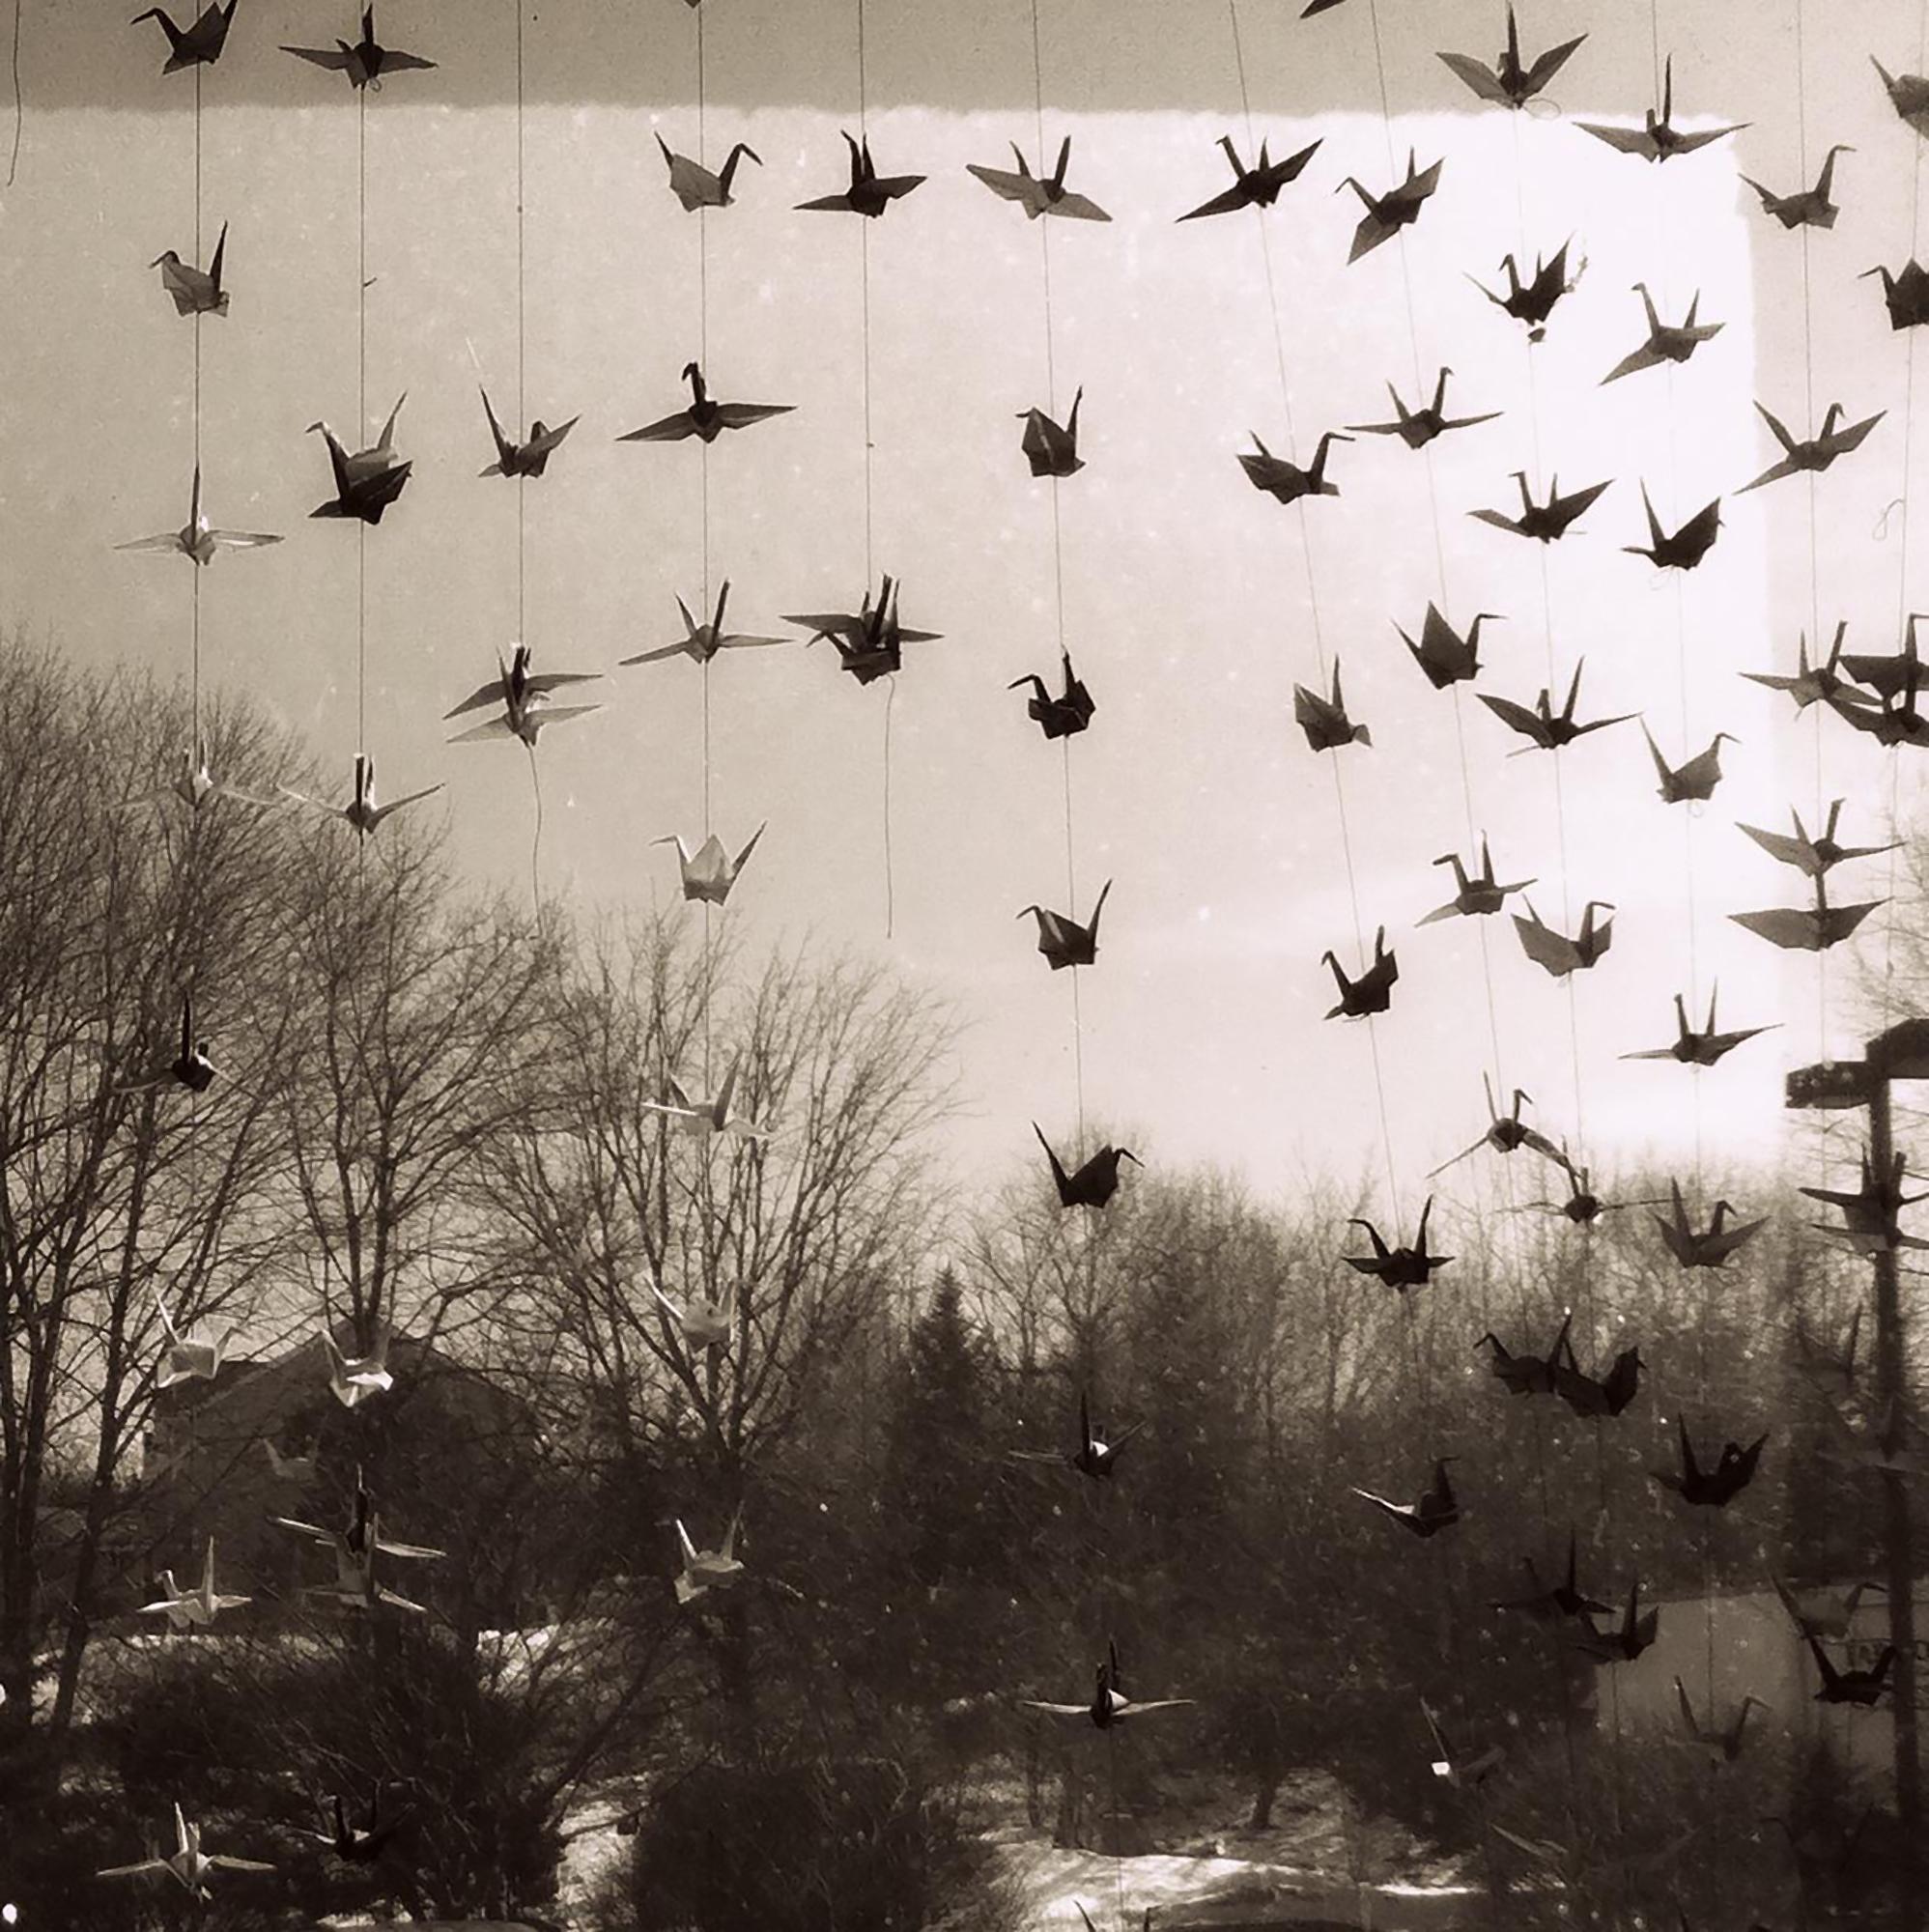 Paul Bilger,  Paper Cranes  (digital photograph)